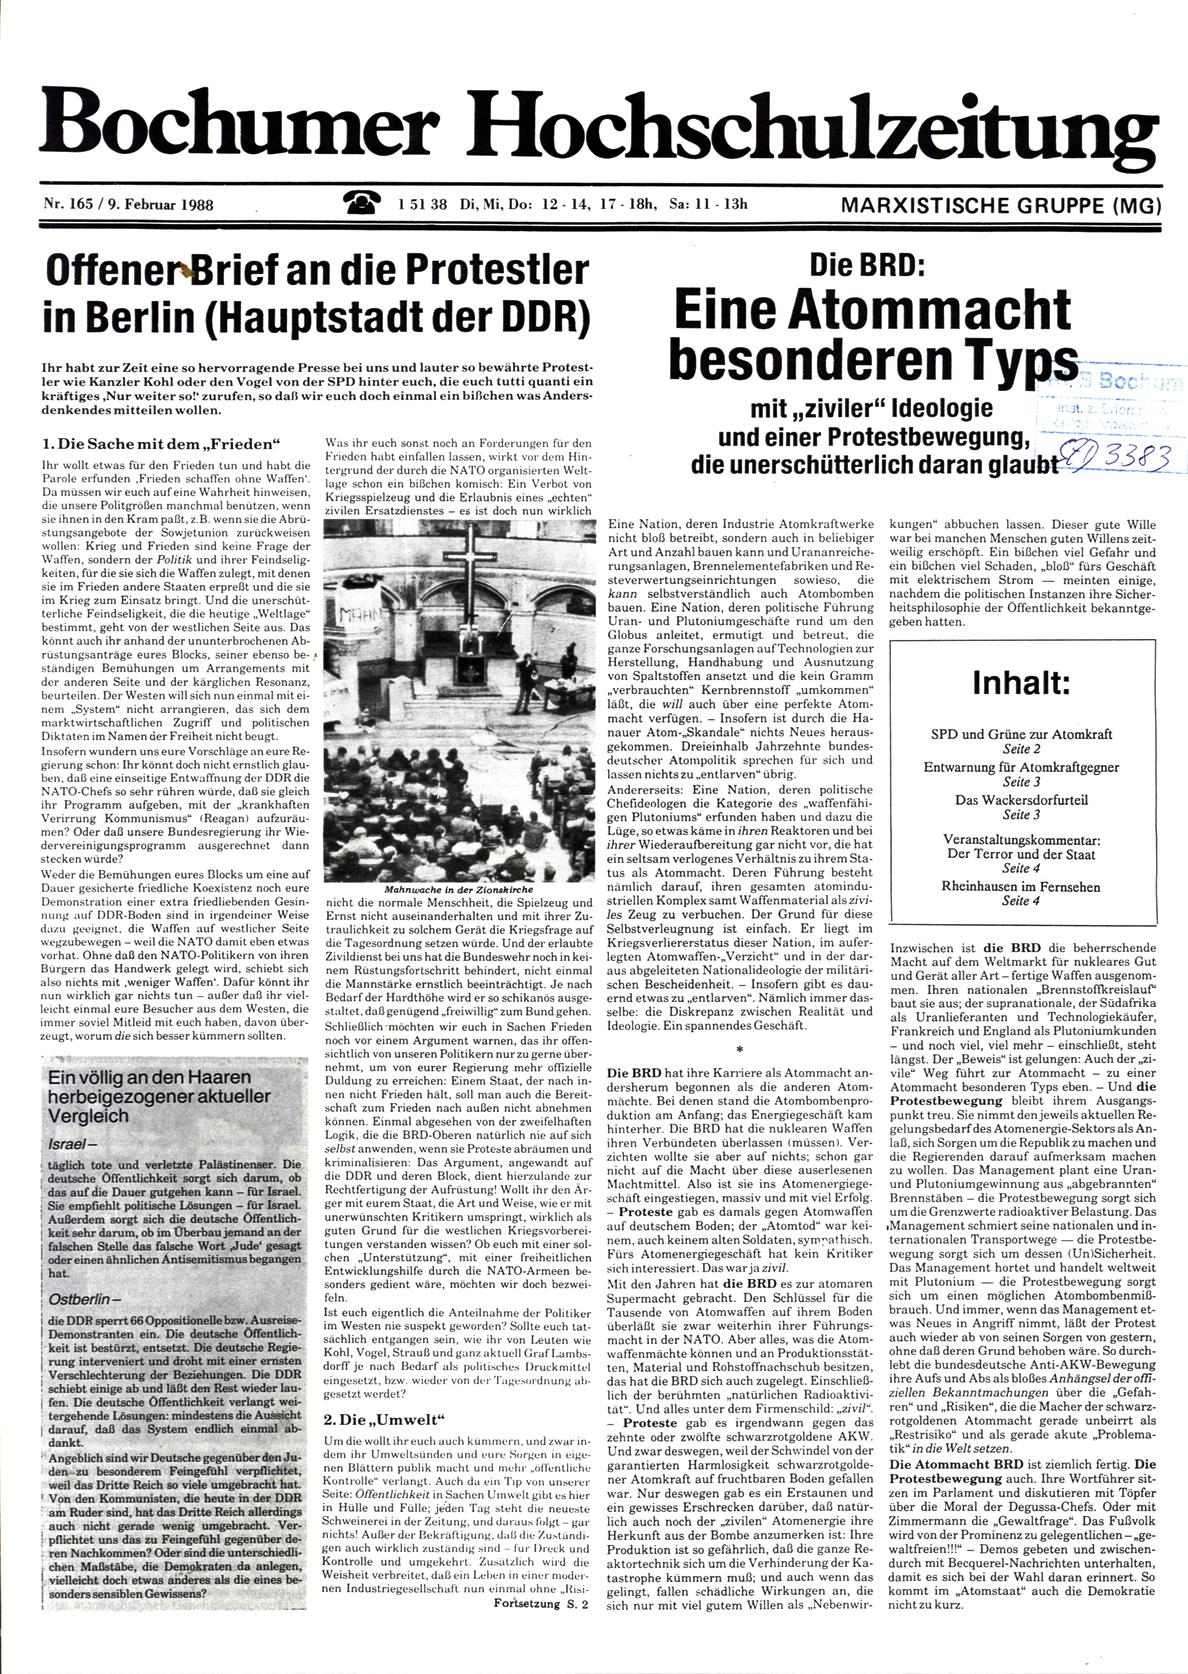 Bochum_BHZ_19880209_165_001